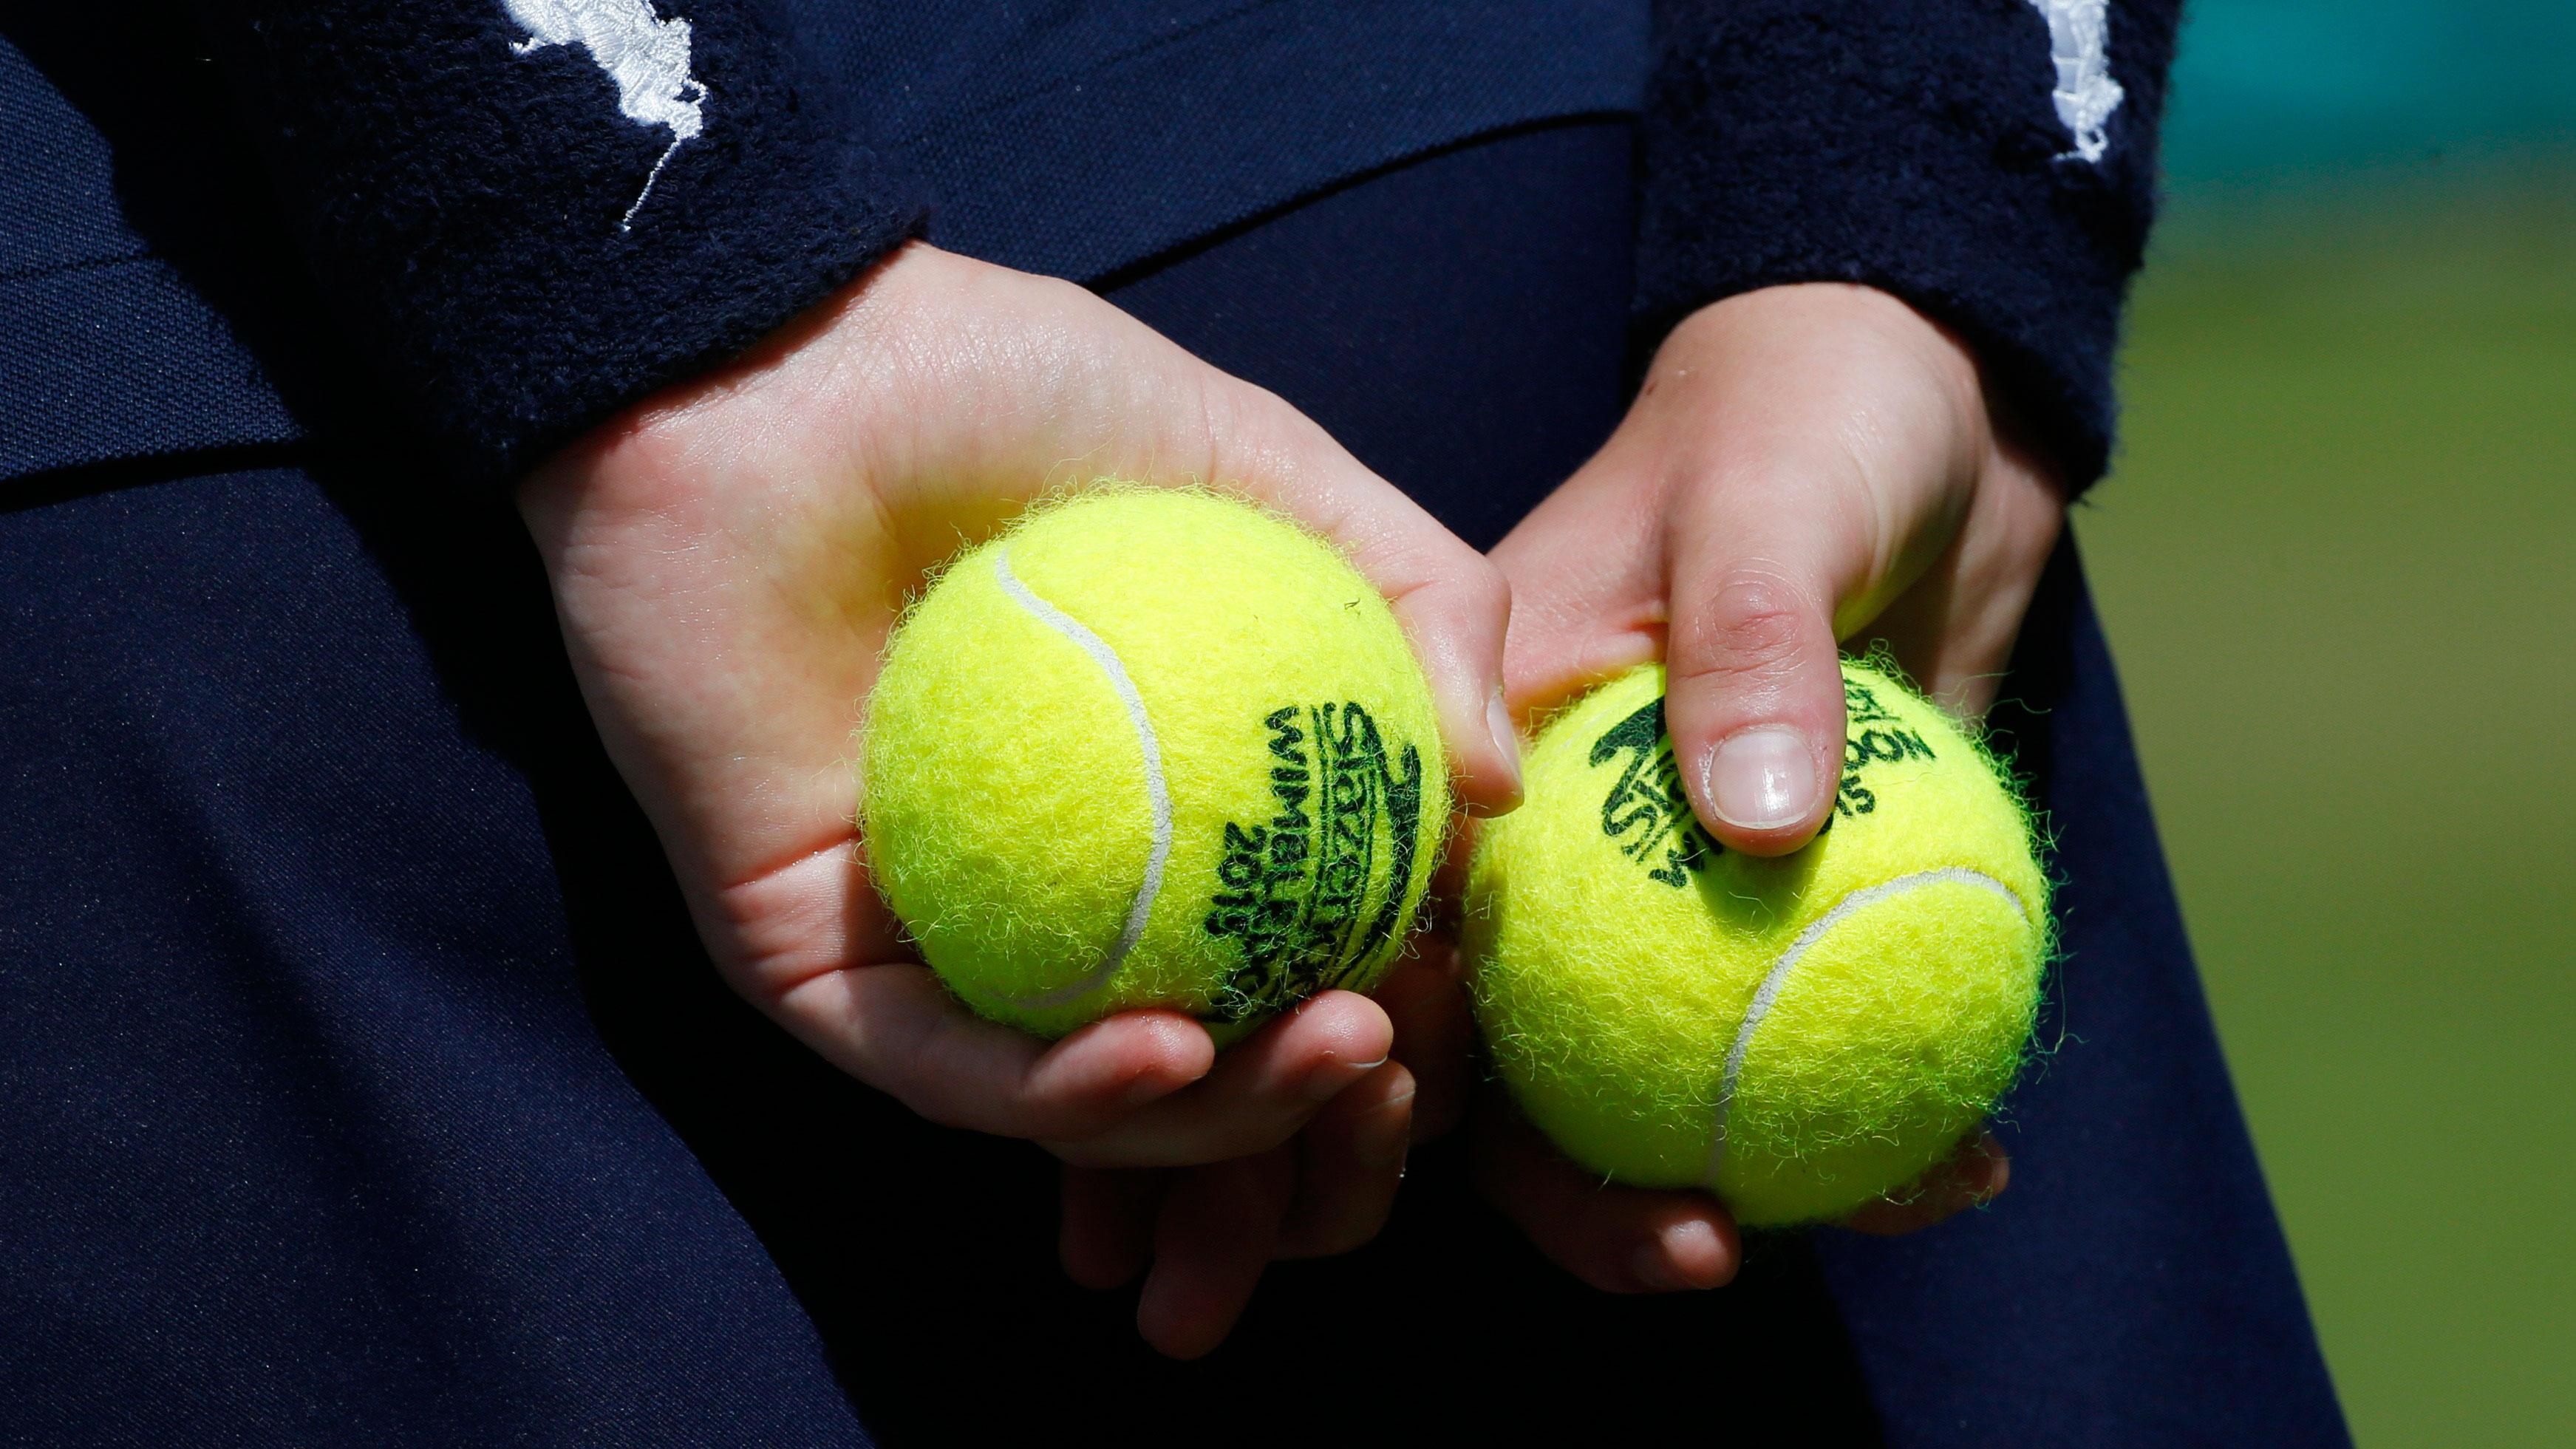 A ball girl holds tennis balls at the Wimbledon Tennis Championships in London